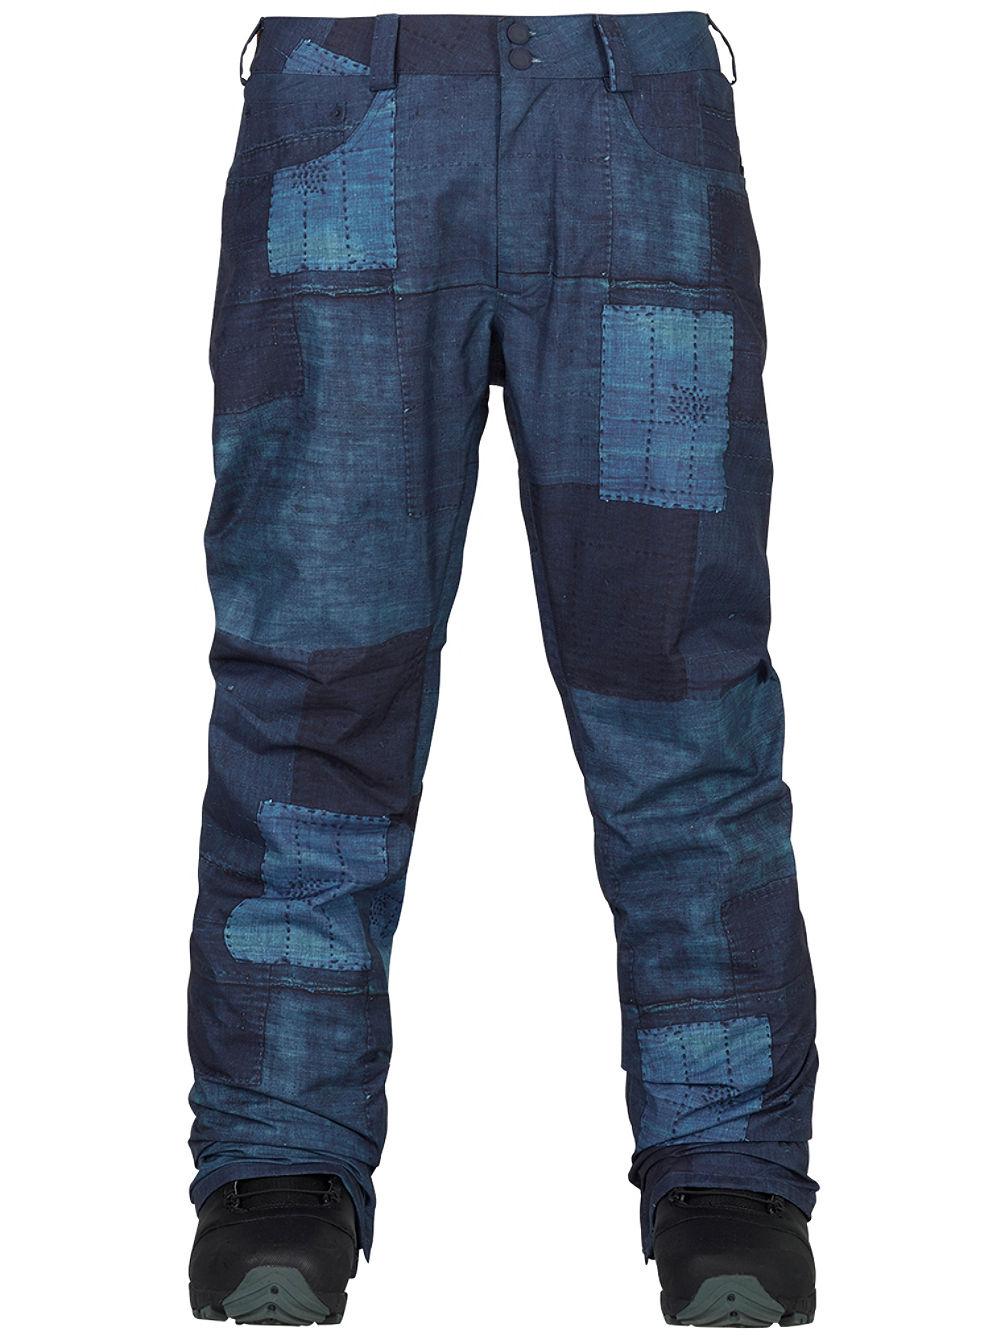 d1dafab0e47 Buy Burton Twc Greenlight Pants online at blue-tomato.com